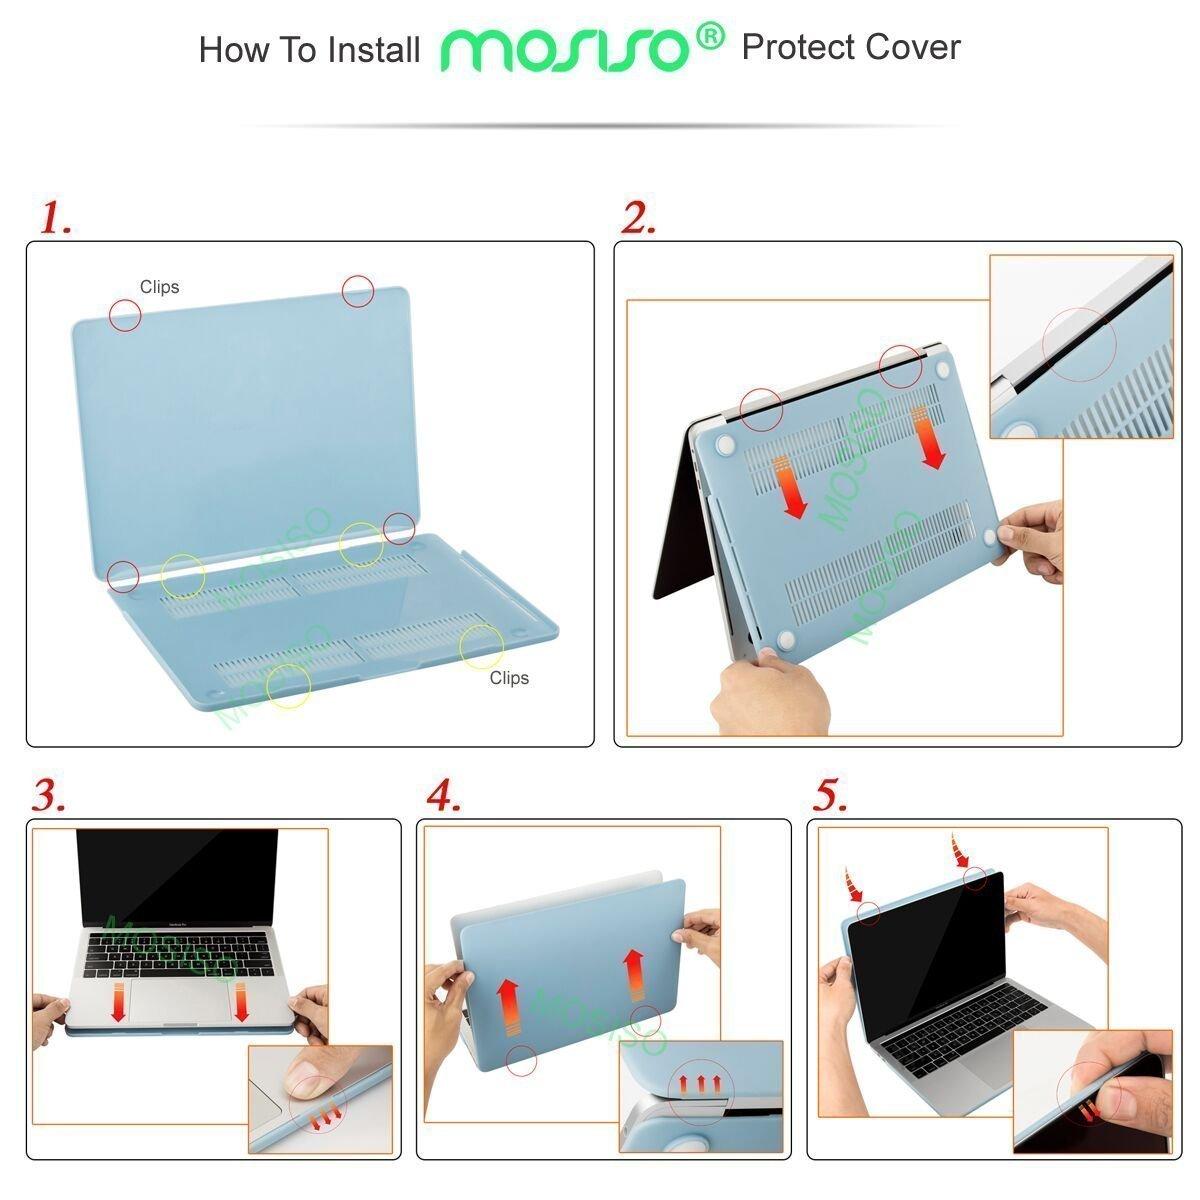 MOSISO H/ülle Kompatibel MacBook Pro 13 2018/&2017/&2016 Version A1989//A1706//A1708 Plastik H/ülle mit Klar Tastaturschutz mit Displayschutz Kompatibel MacBook Pro 13 Zoll Klar//Kristall